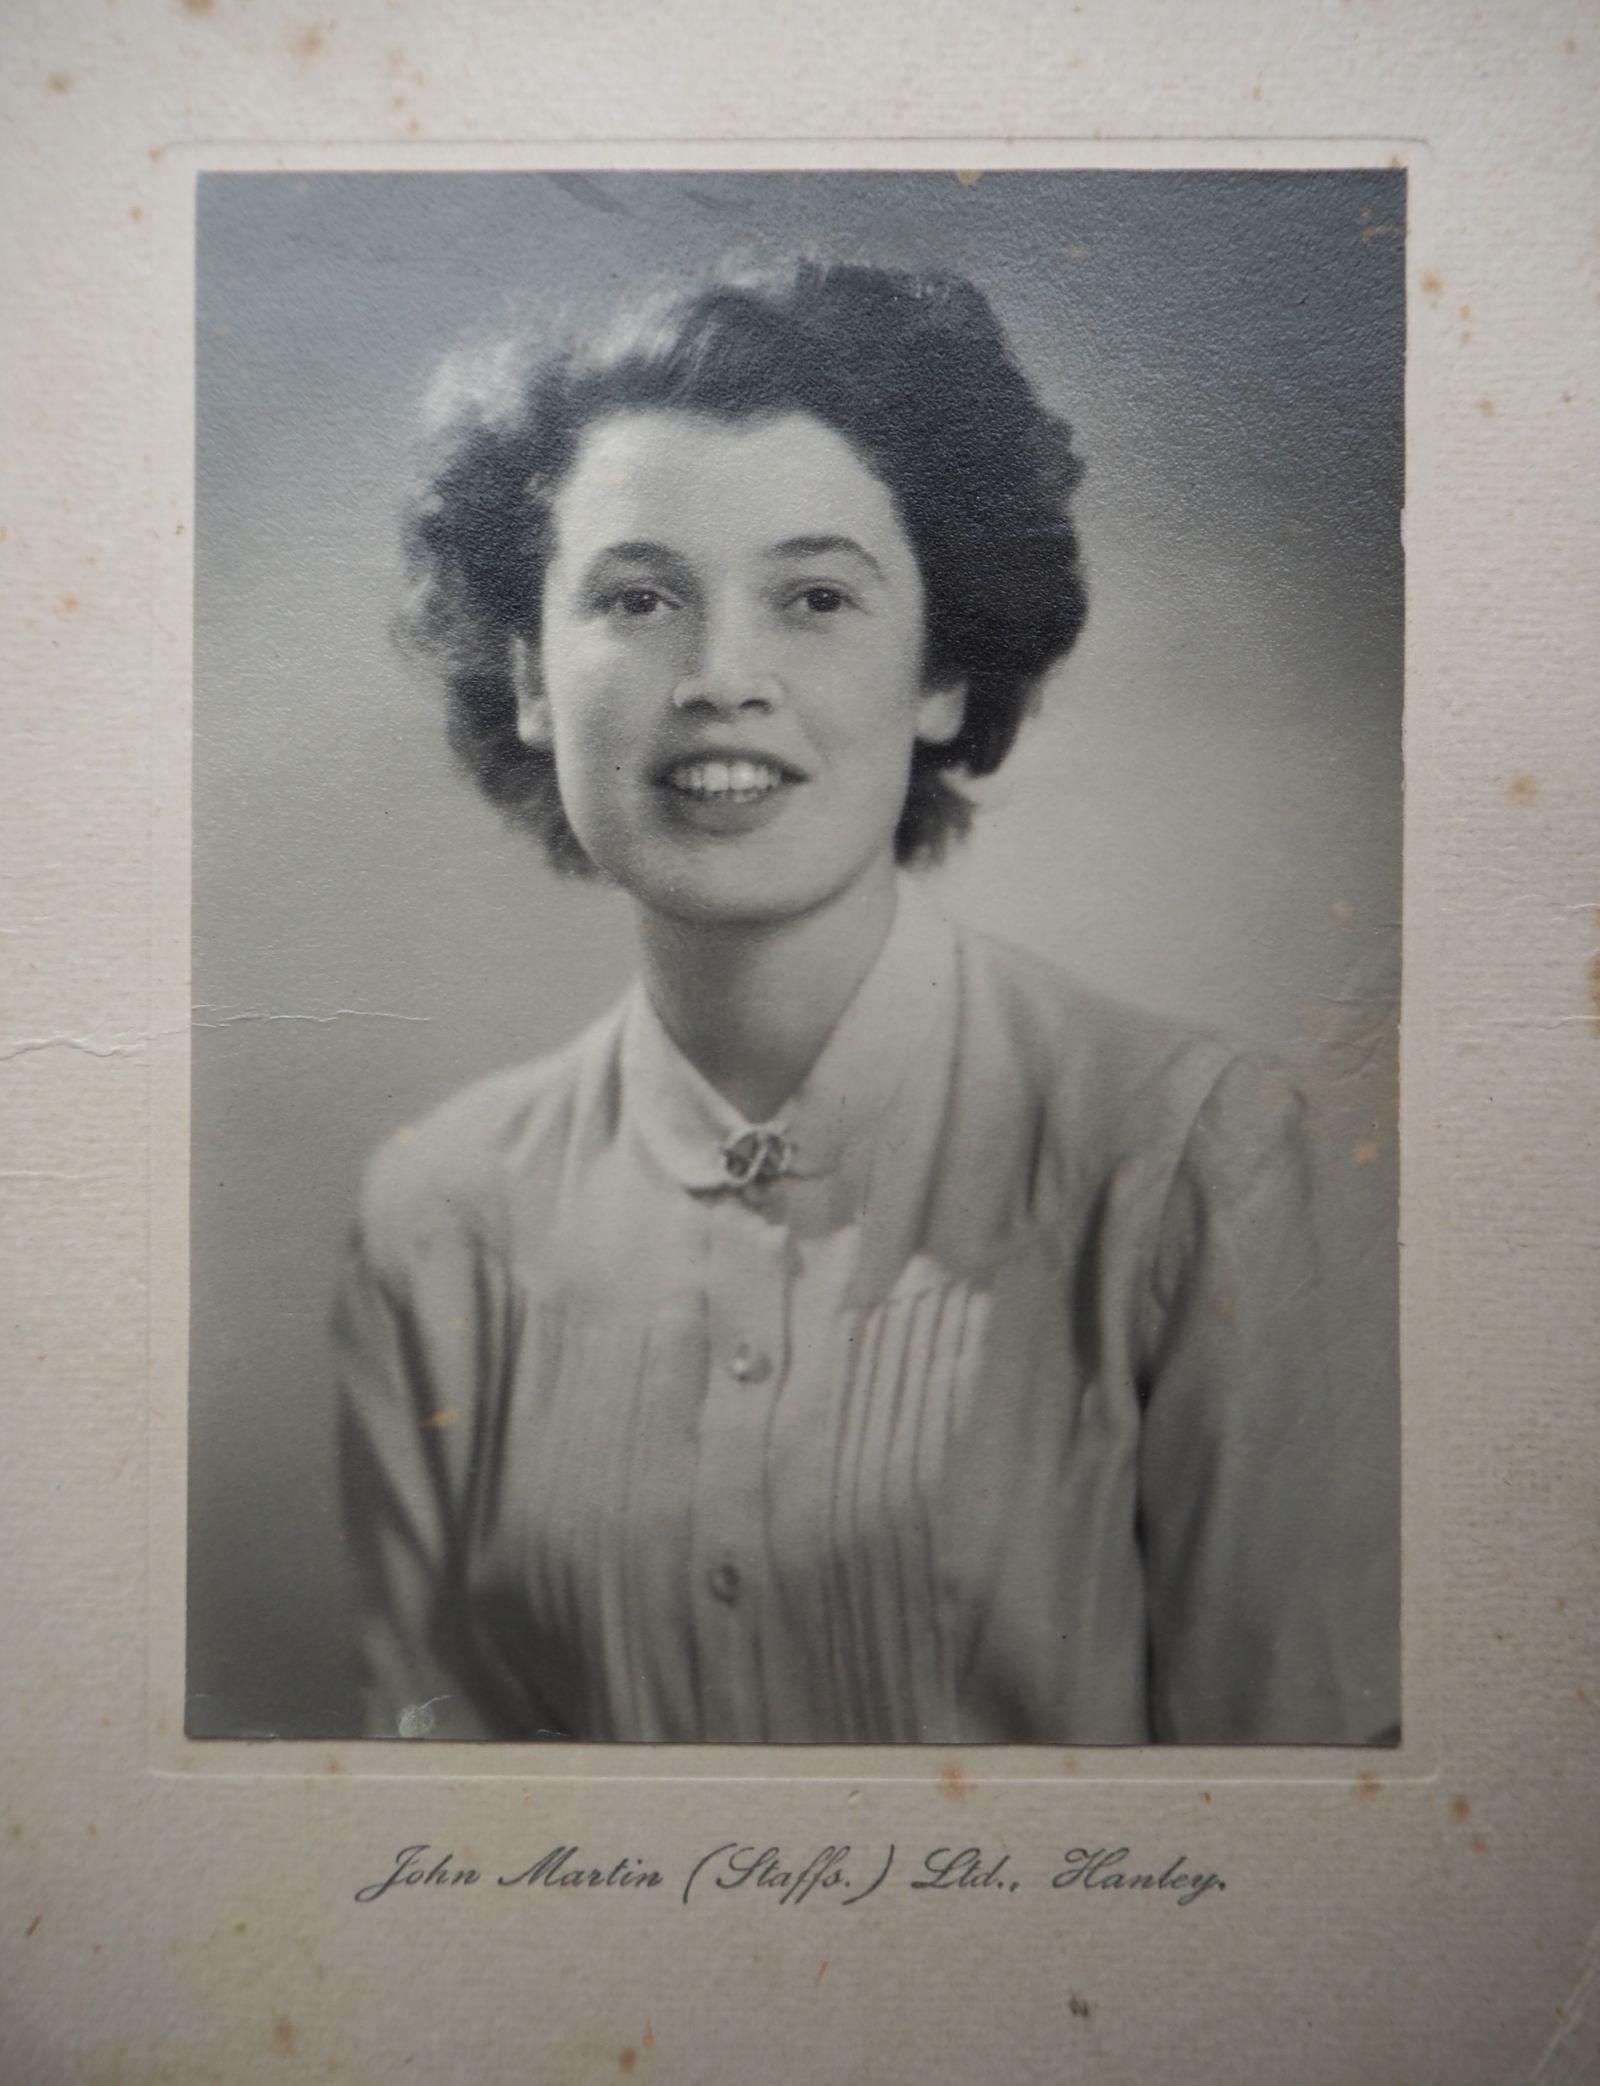 Joy Milward